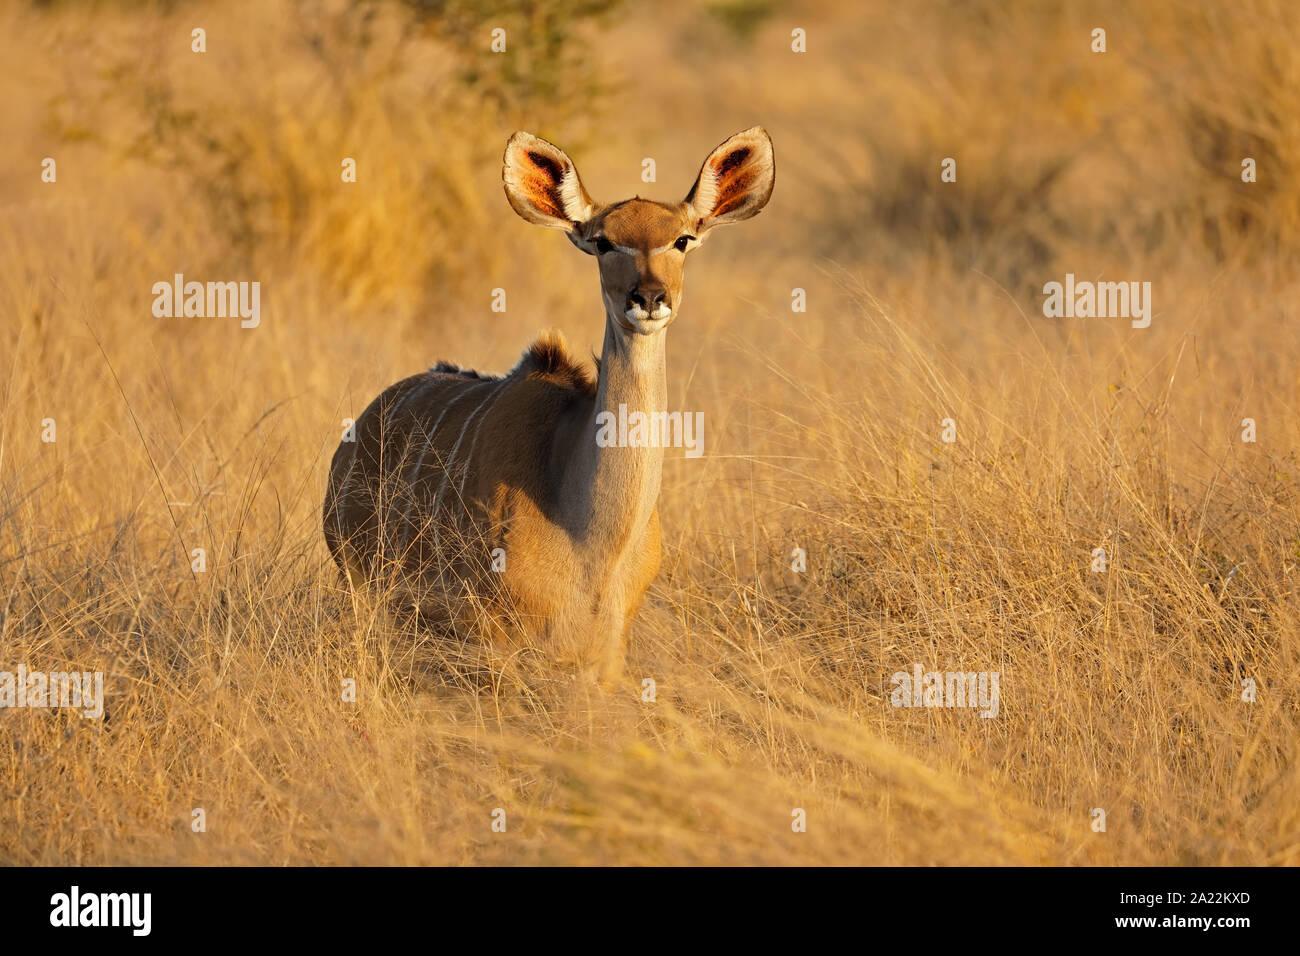 Female kudu antelope (Tragelaphus strepsiceros), Kruger National Park, South Africa Stock Photo